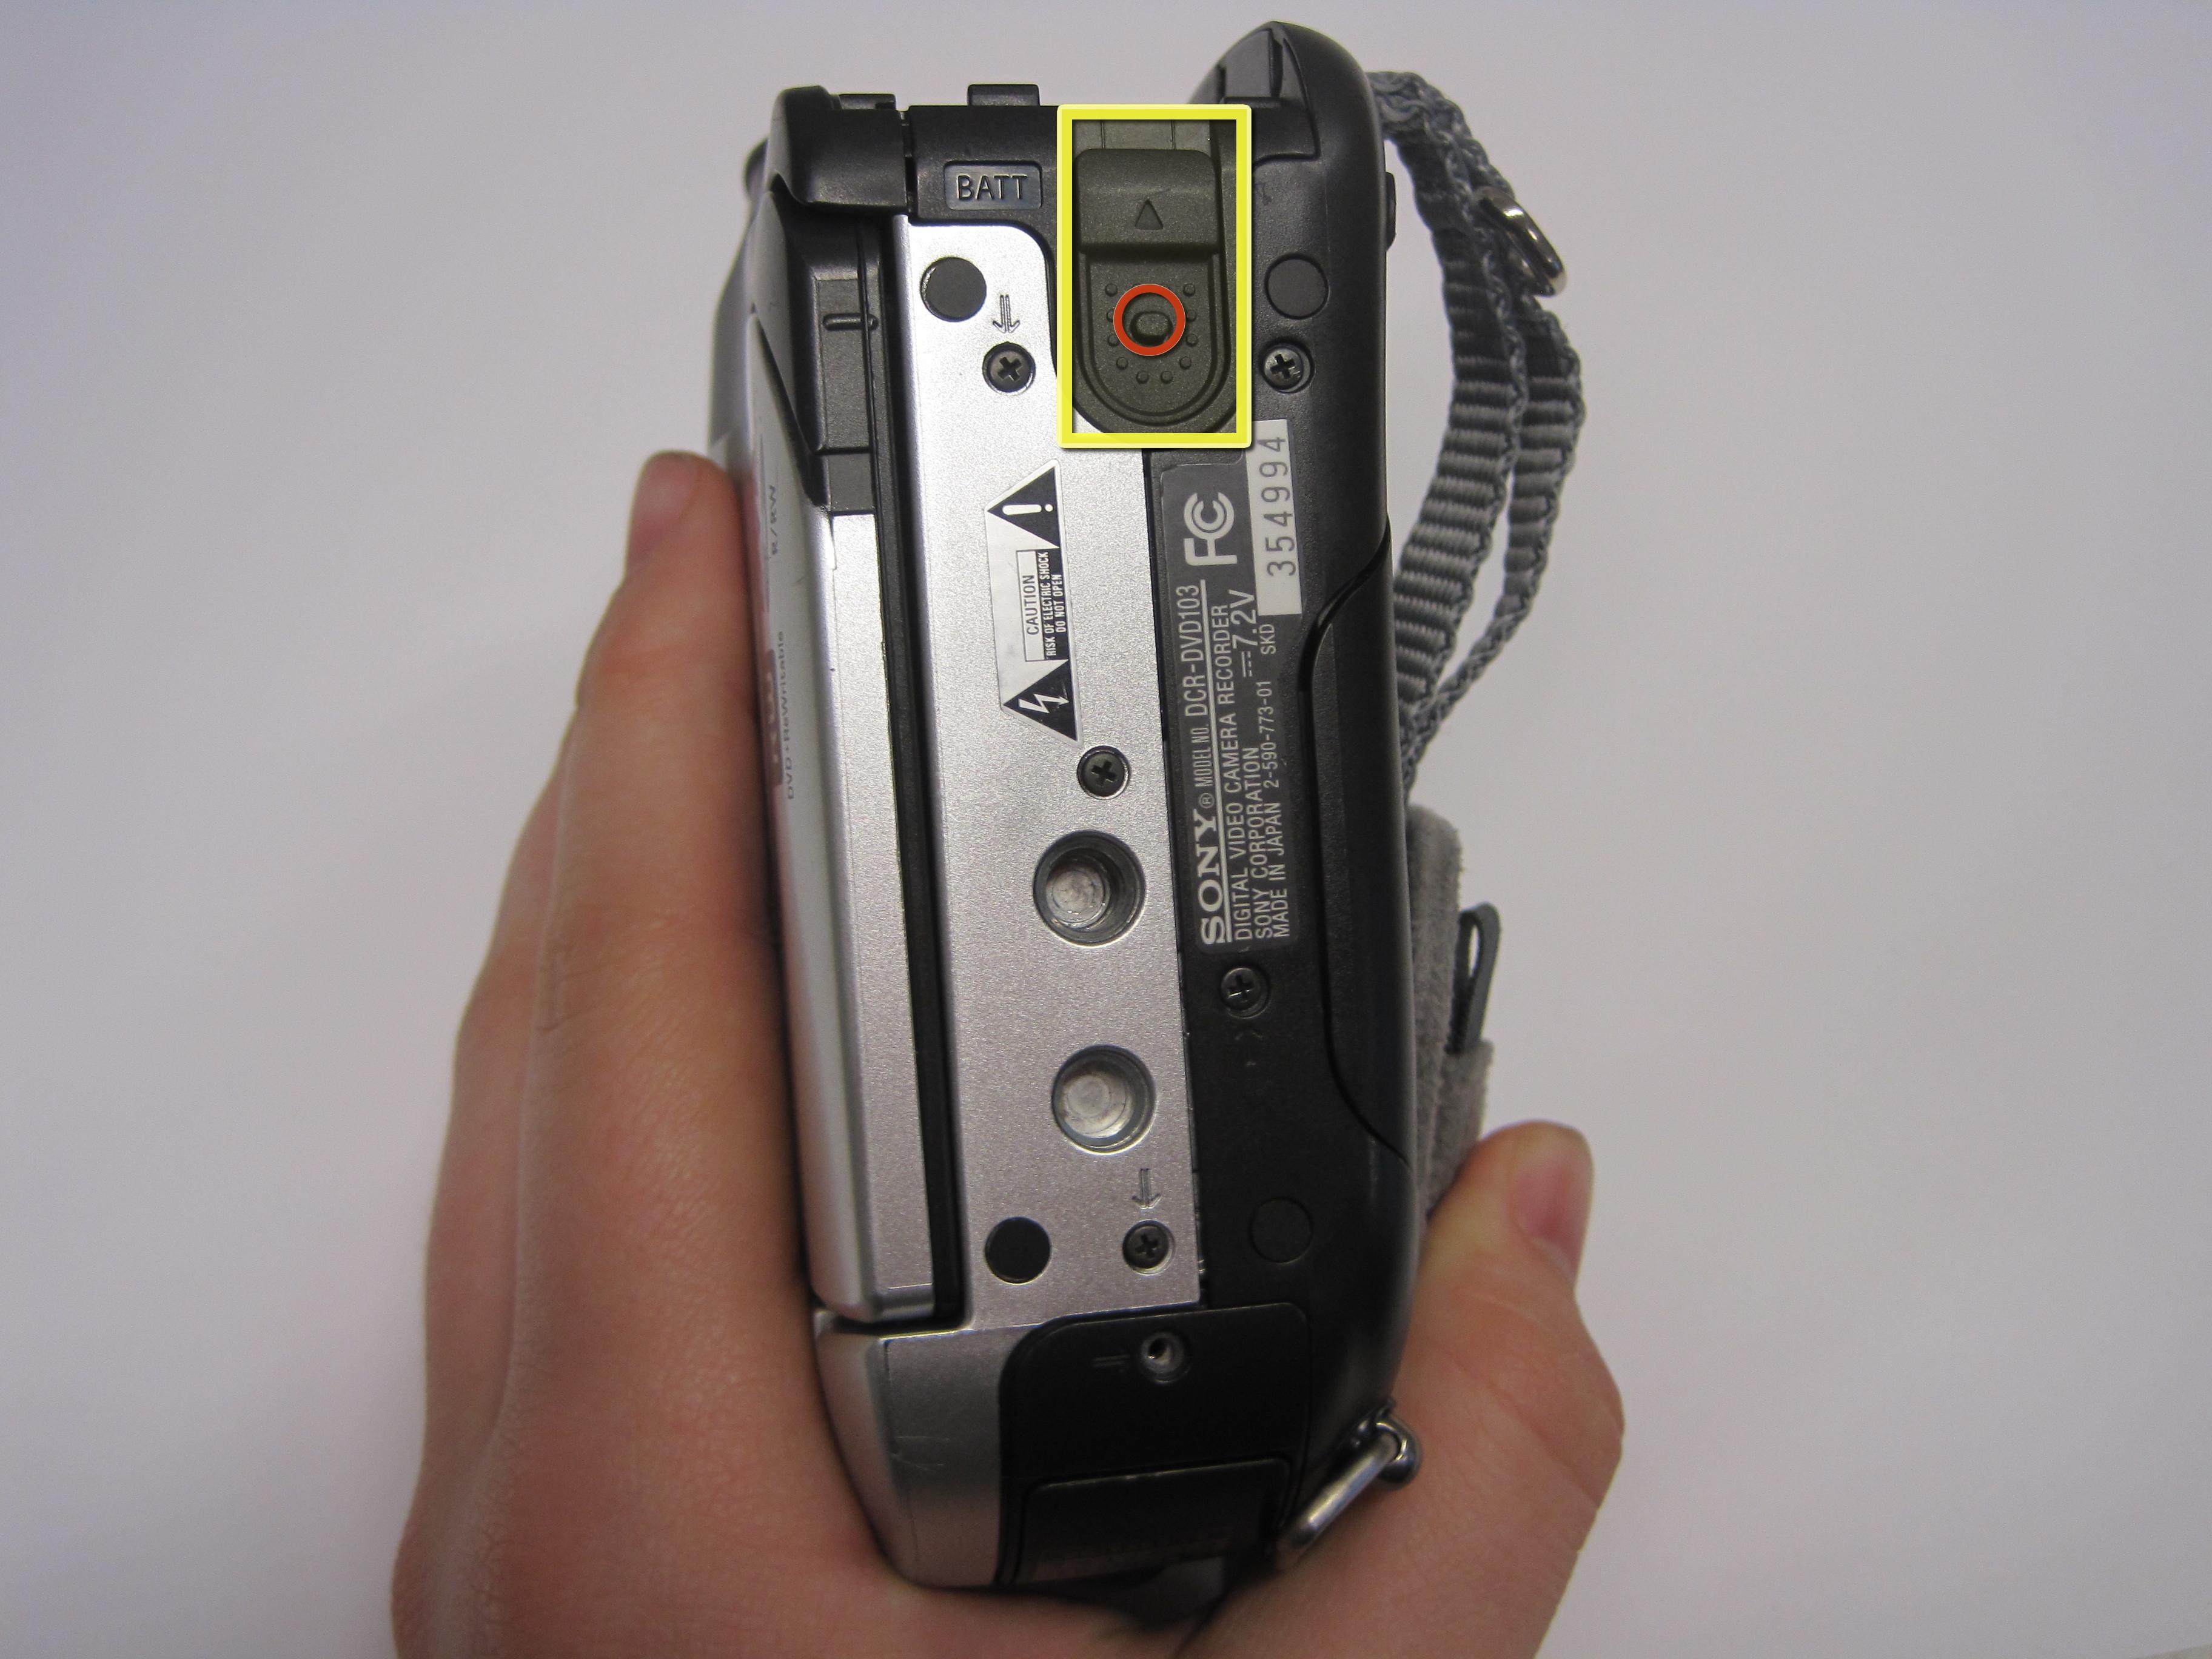 Sony Handycam Dcr Dvd103 Repair Ifixit Xbox 360 Battery